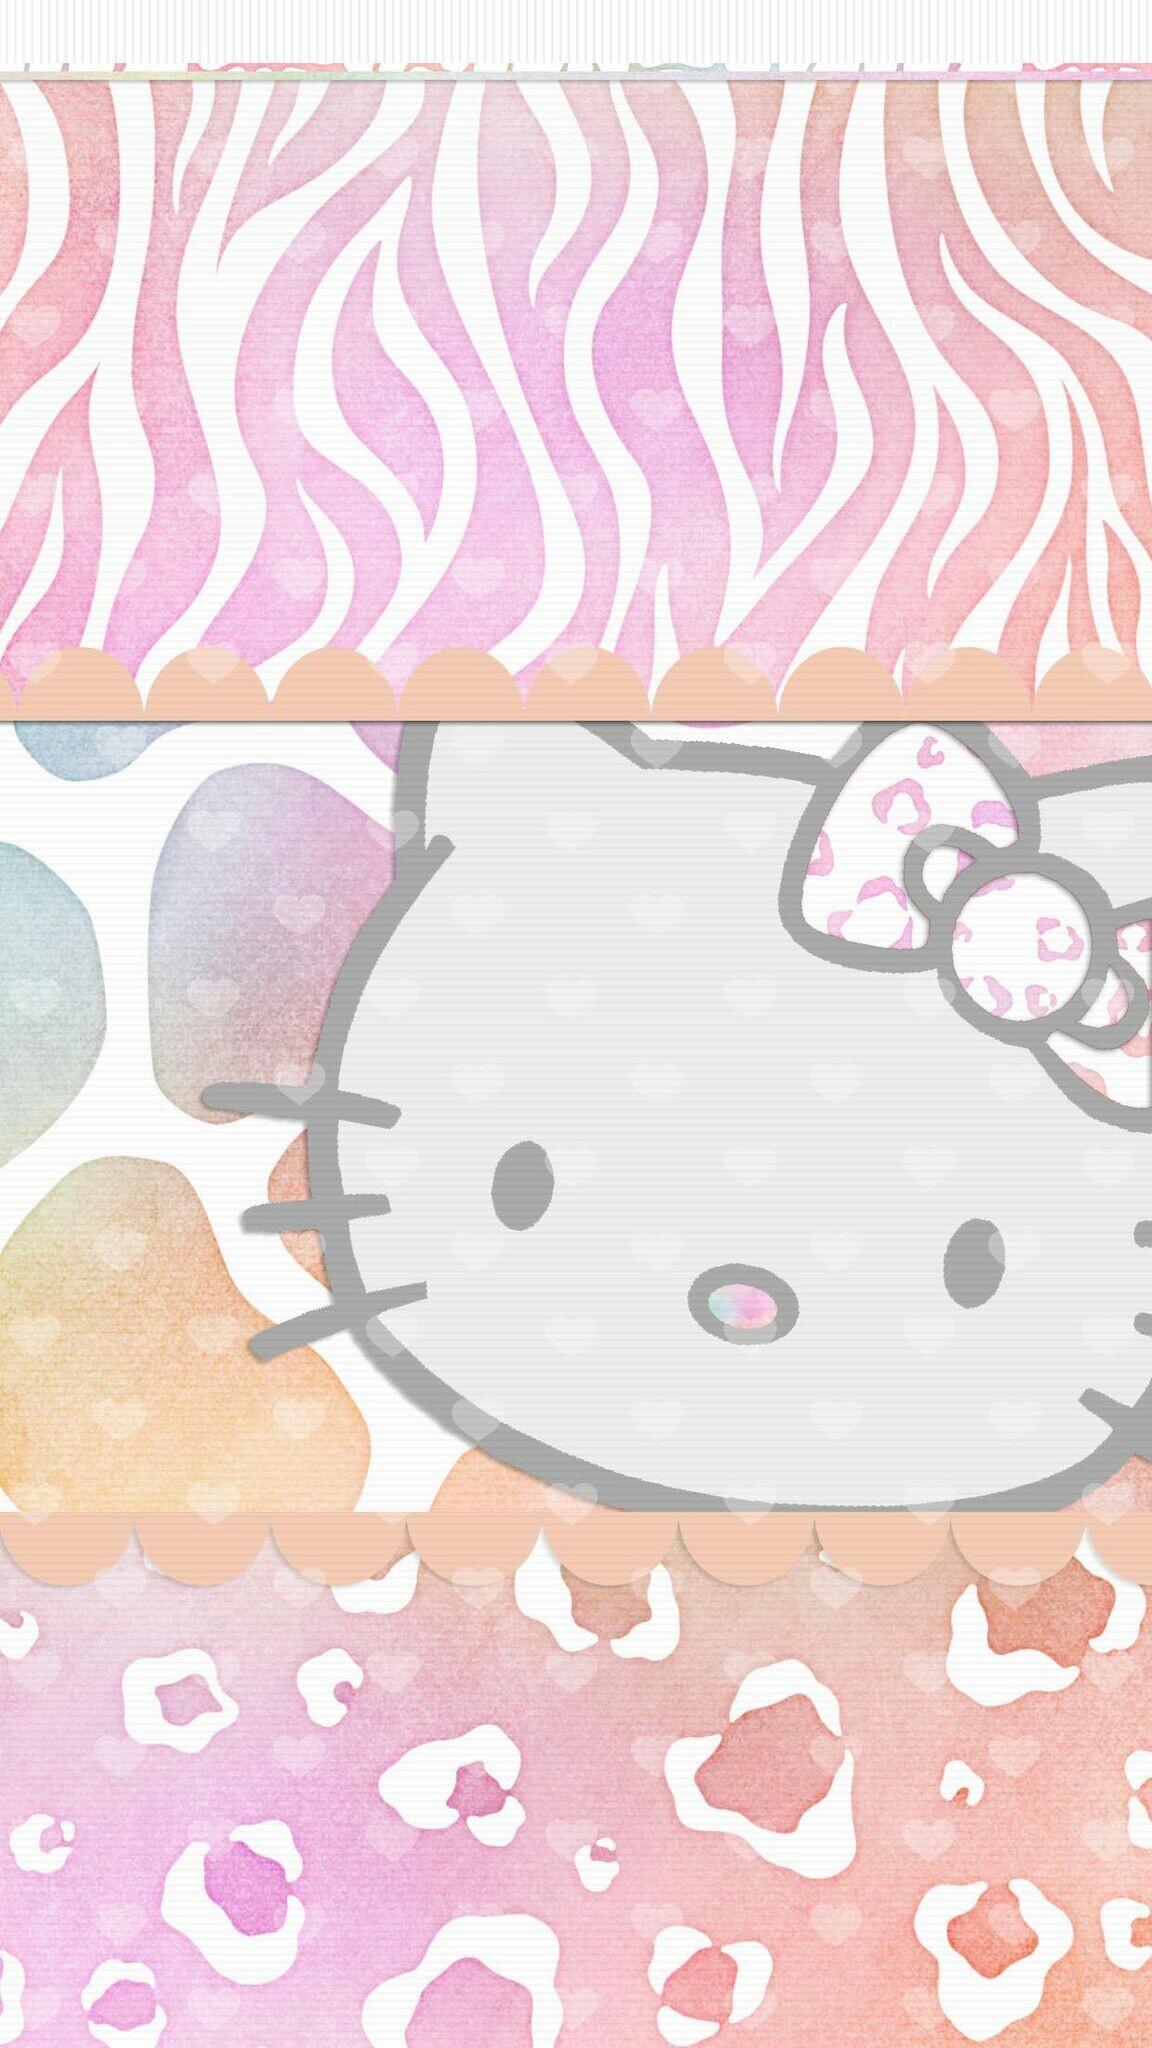 Wonderful Wallpaper Hello Kitty Galaxy - 779152-wallpaper-background-hello-kitty-1152x2048-for-samsung-galaxy  2018_635843.jpg